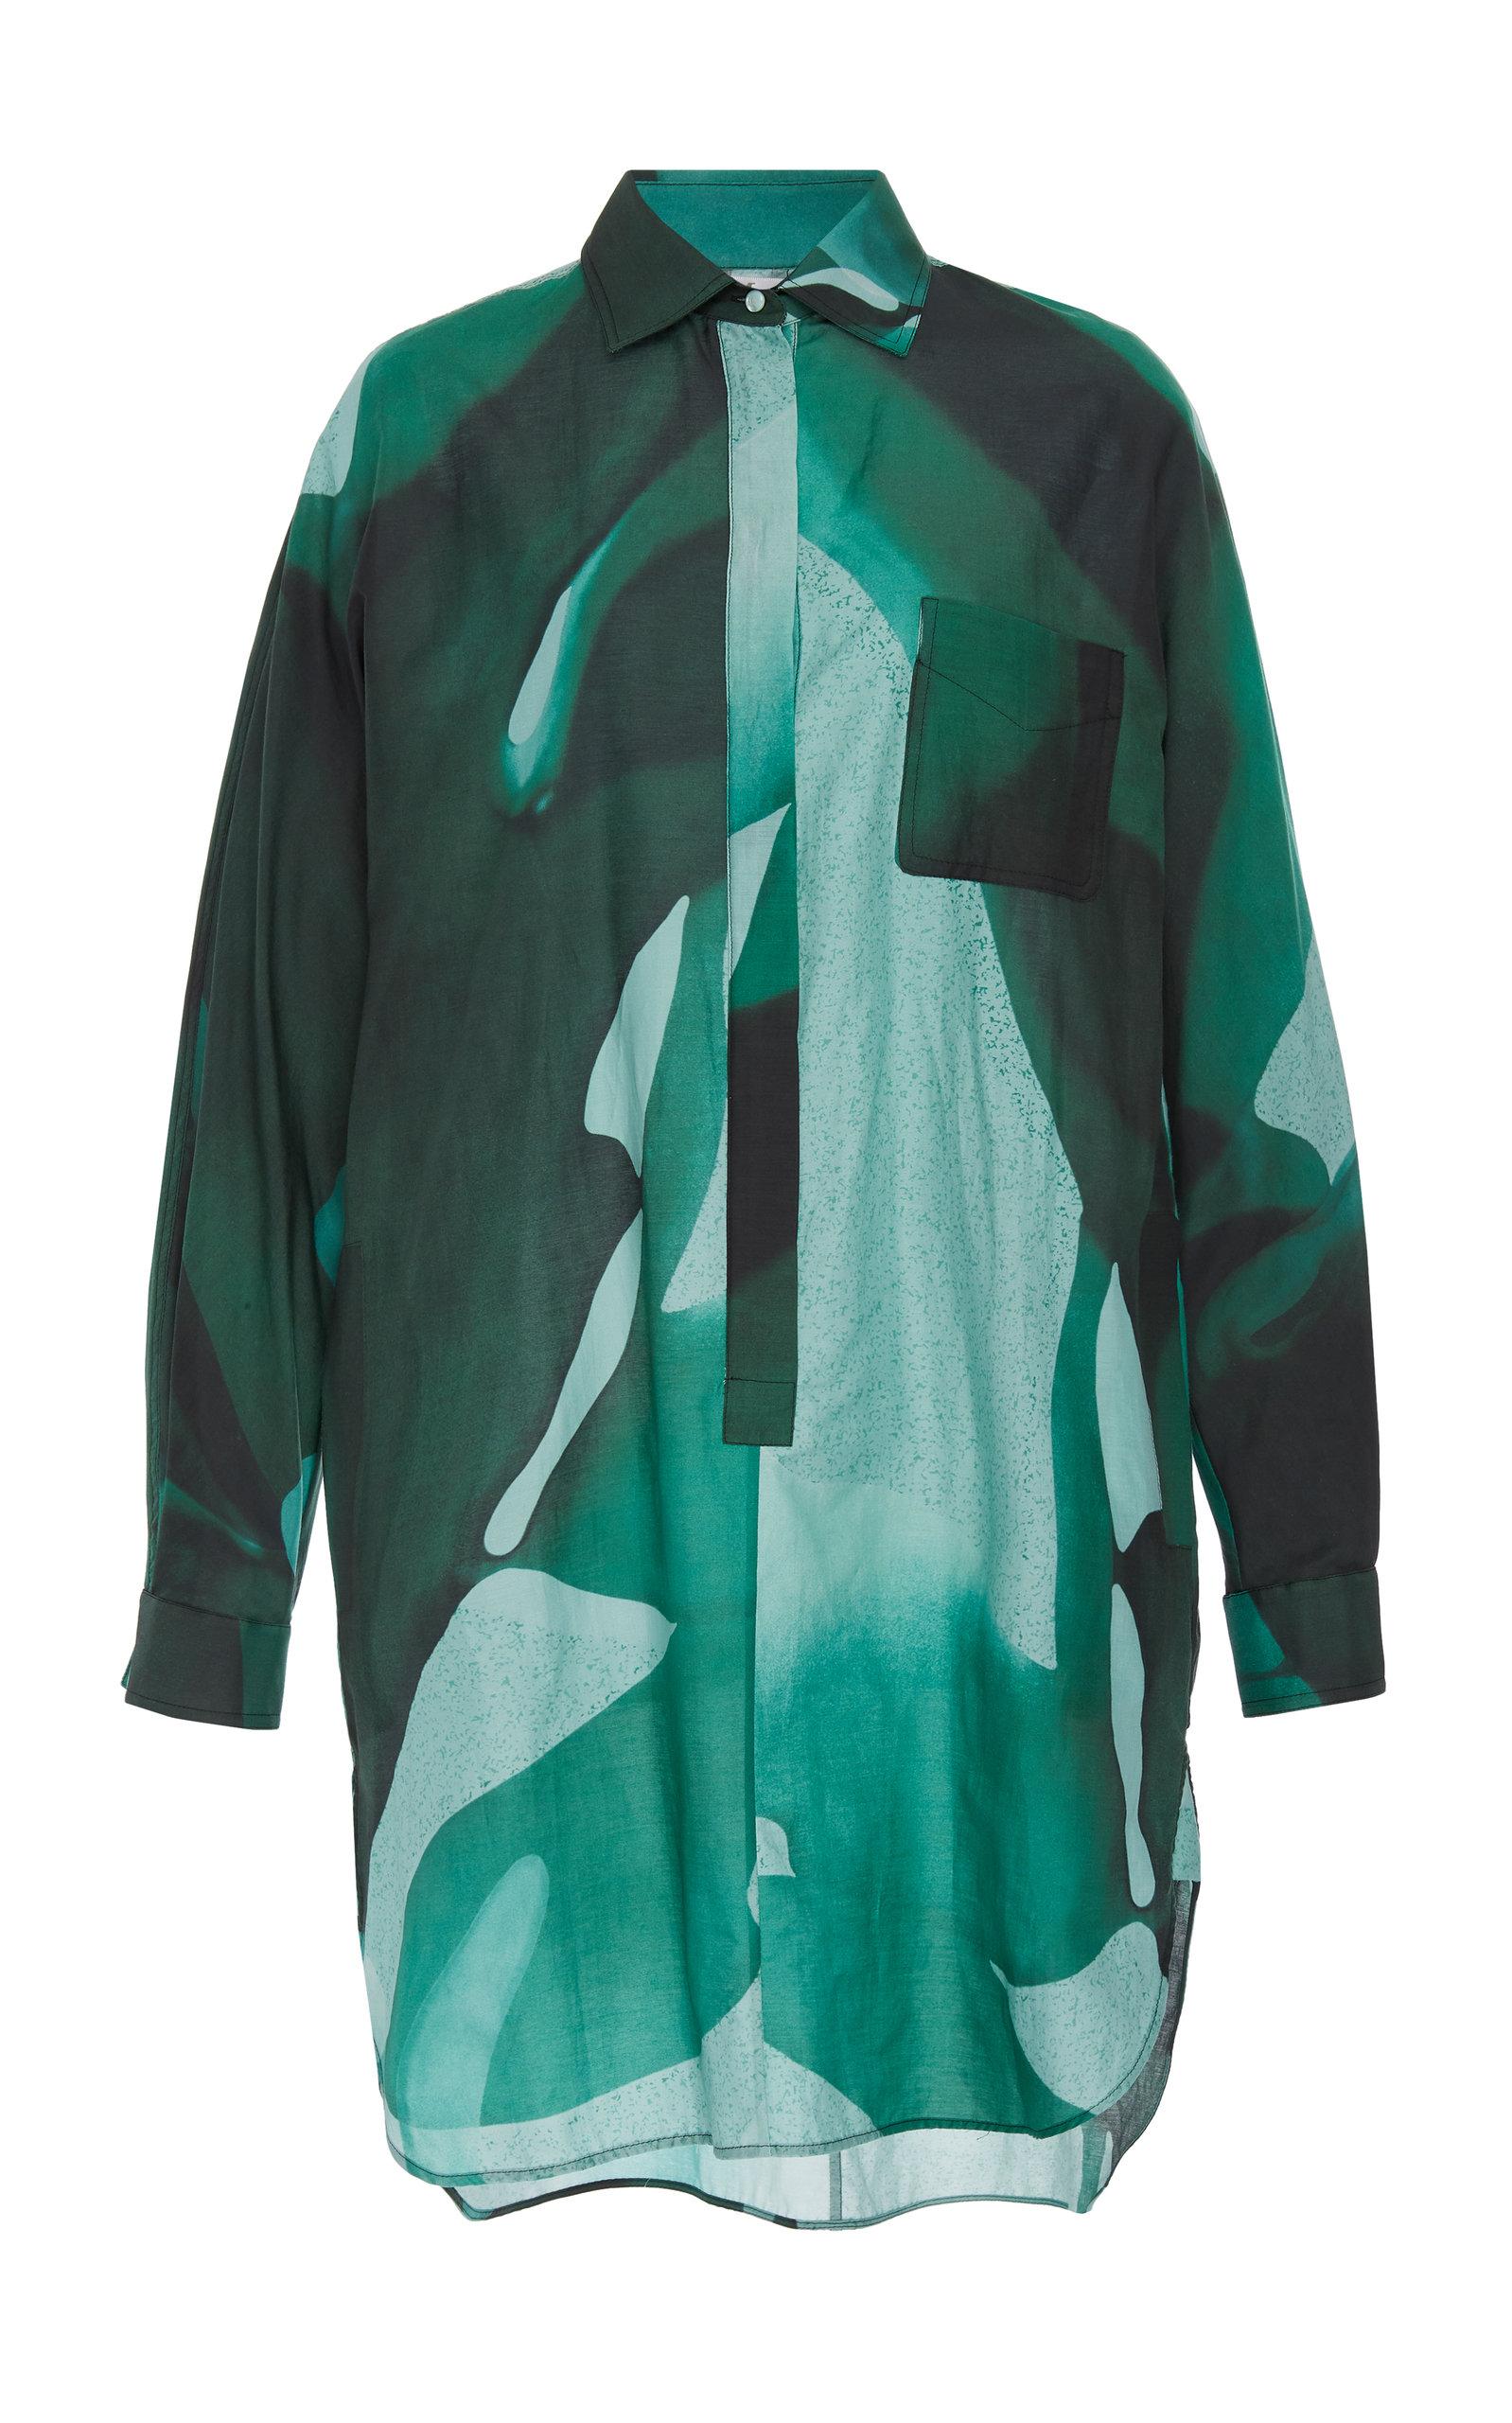 03439cbe059ee Max MaraOversized Printed Cotton-Silk Shirt. CLOSE. Loading